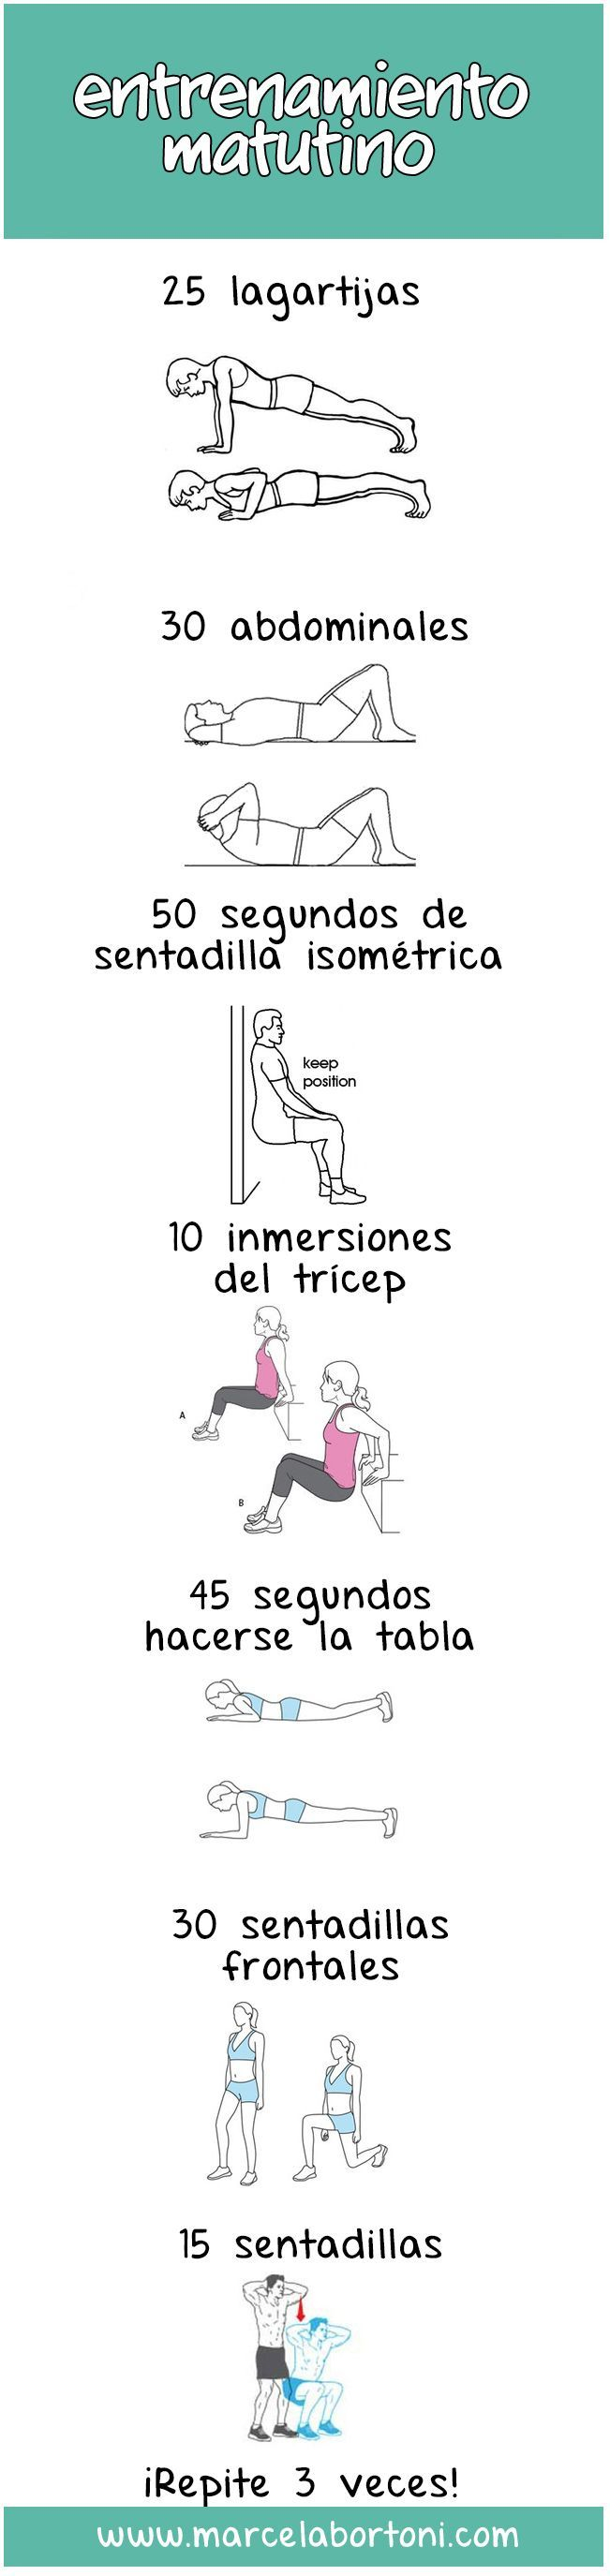 Rutina de ejercicios para iniciar bien el día. #TheTaiSpa #BuenosDiasTai #Fitness